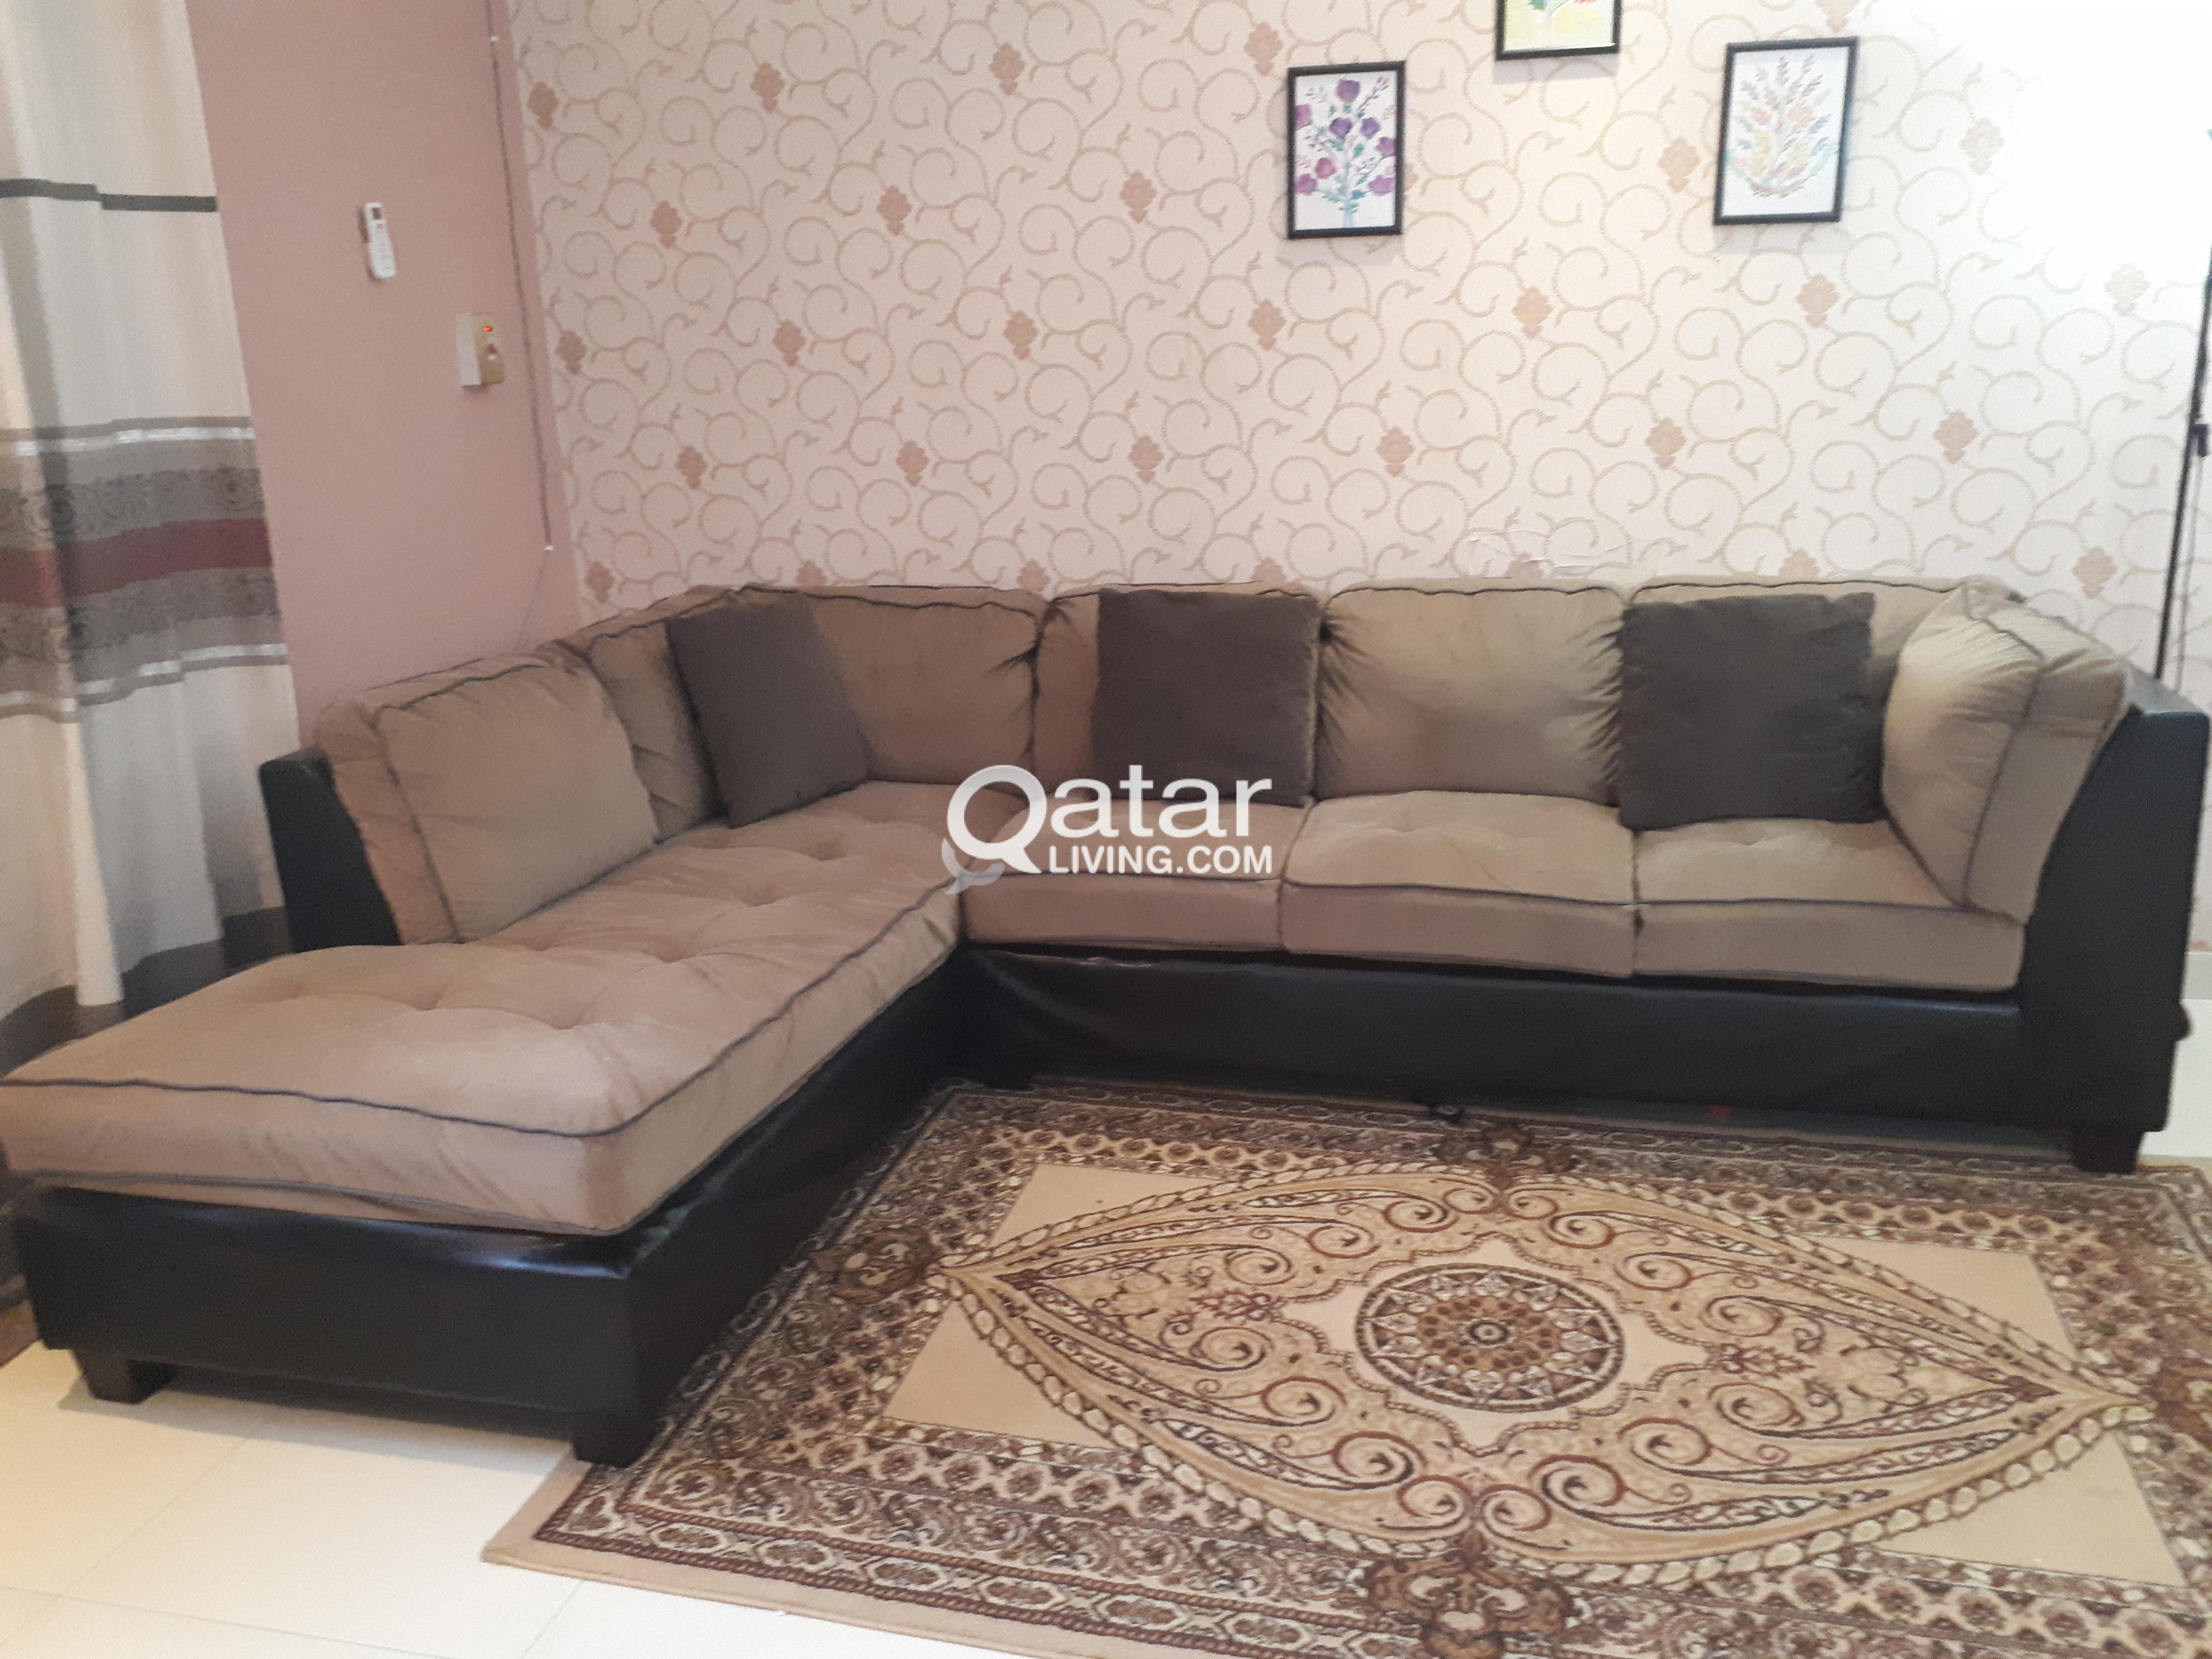 Sofa l shap pan emirates qatar living for Sofa bed qatar living